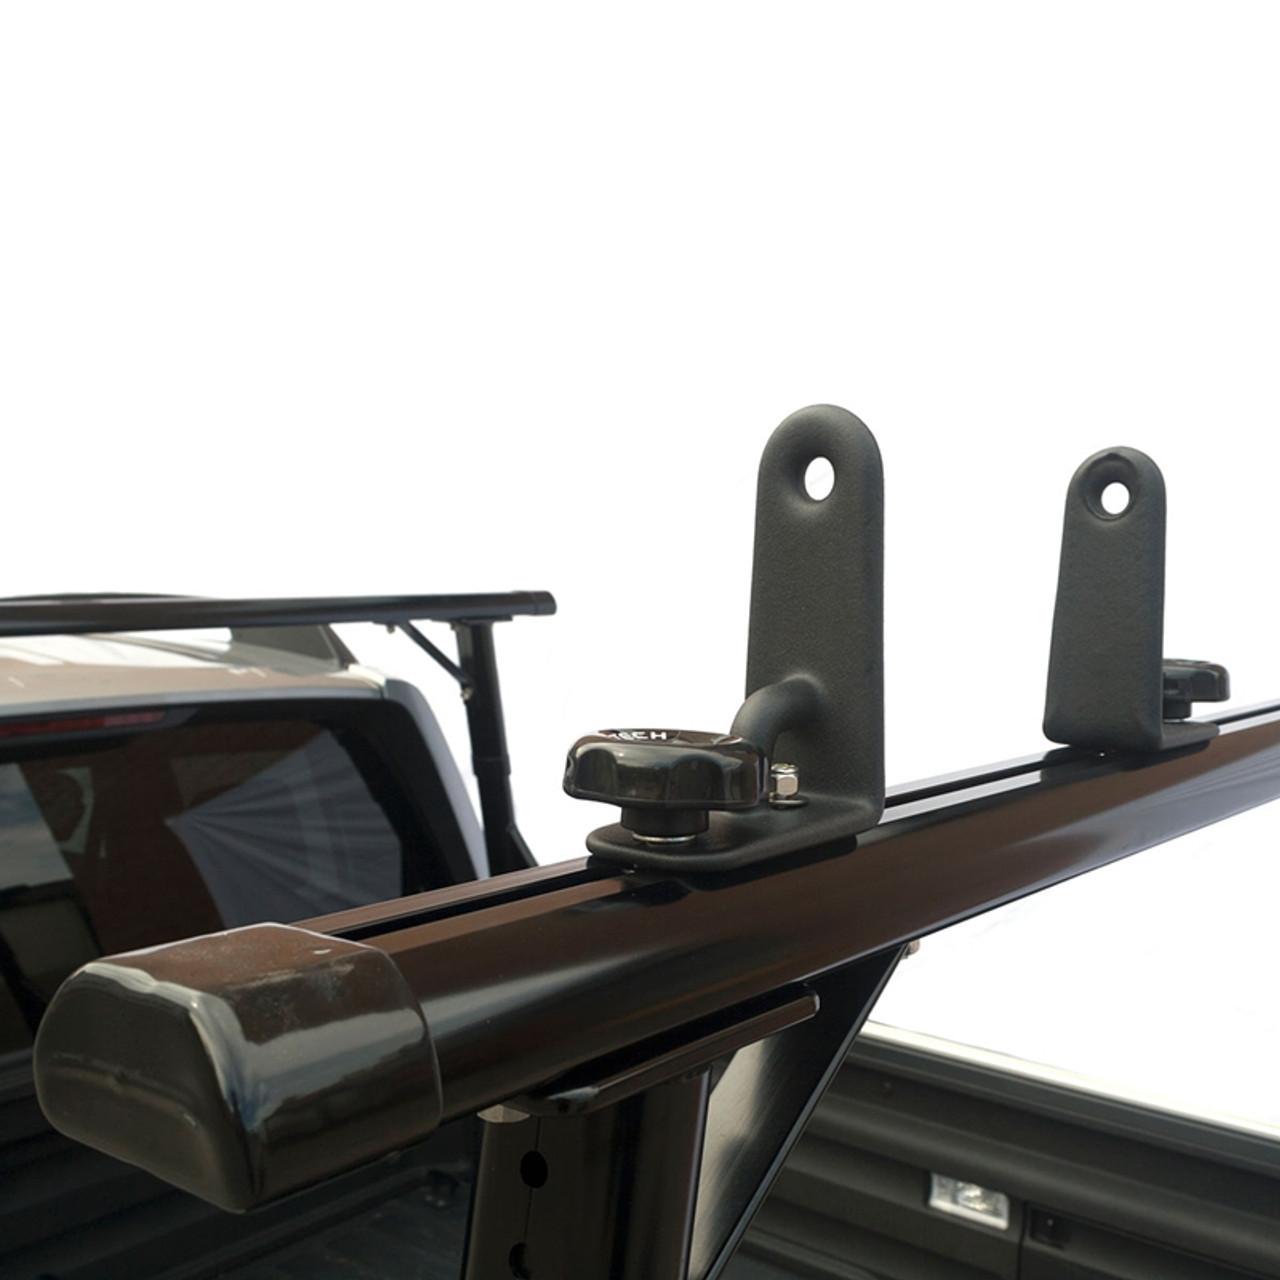 https leonardaccessories com product ladder racks vantech p3000 clamp on aluminum system for standard pickup trucks